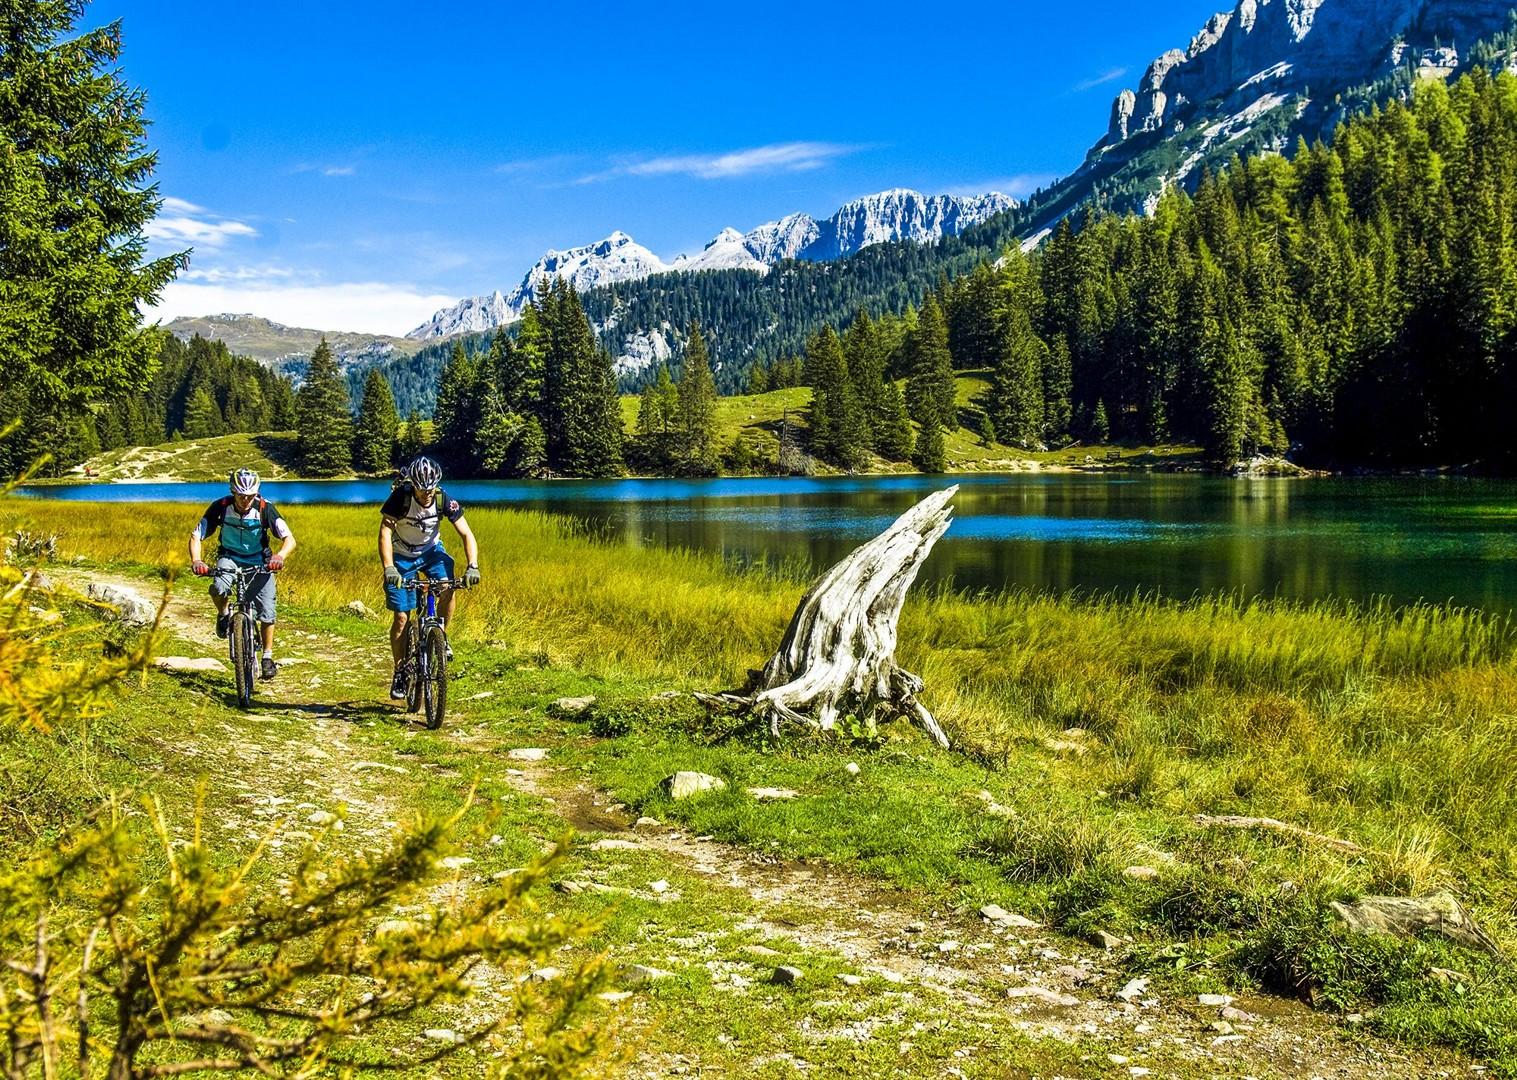 Brenta_Bike_2007_109-2.jpg - Italy - Dolomites of Brenta - Guided Mountain Bike Holiday - Italia Mountain Biking